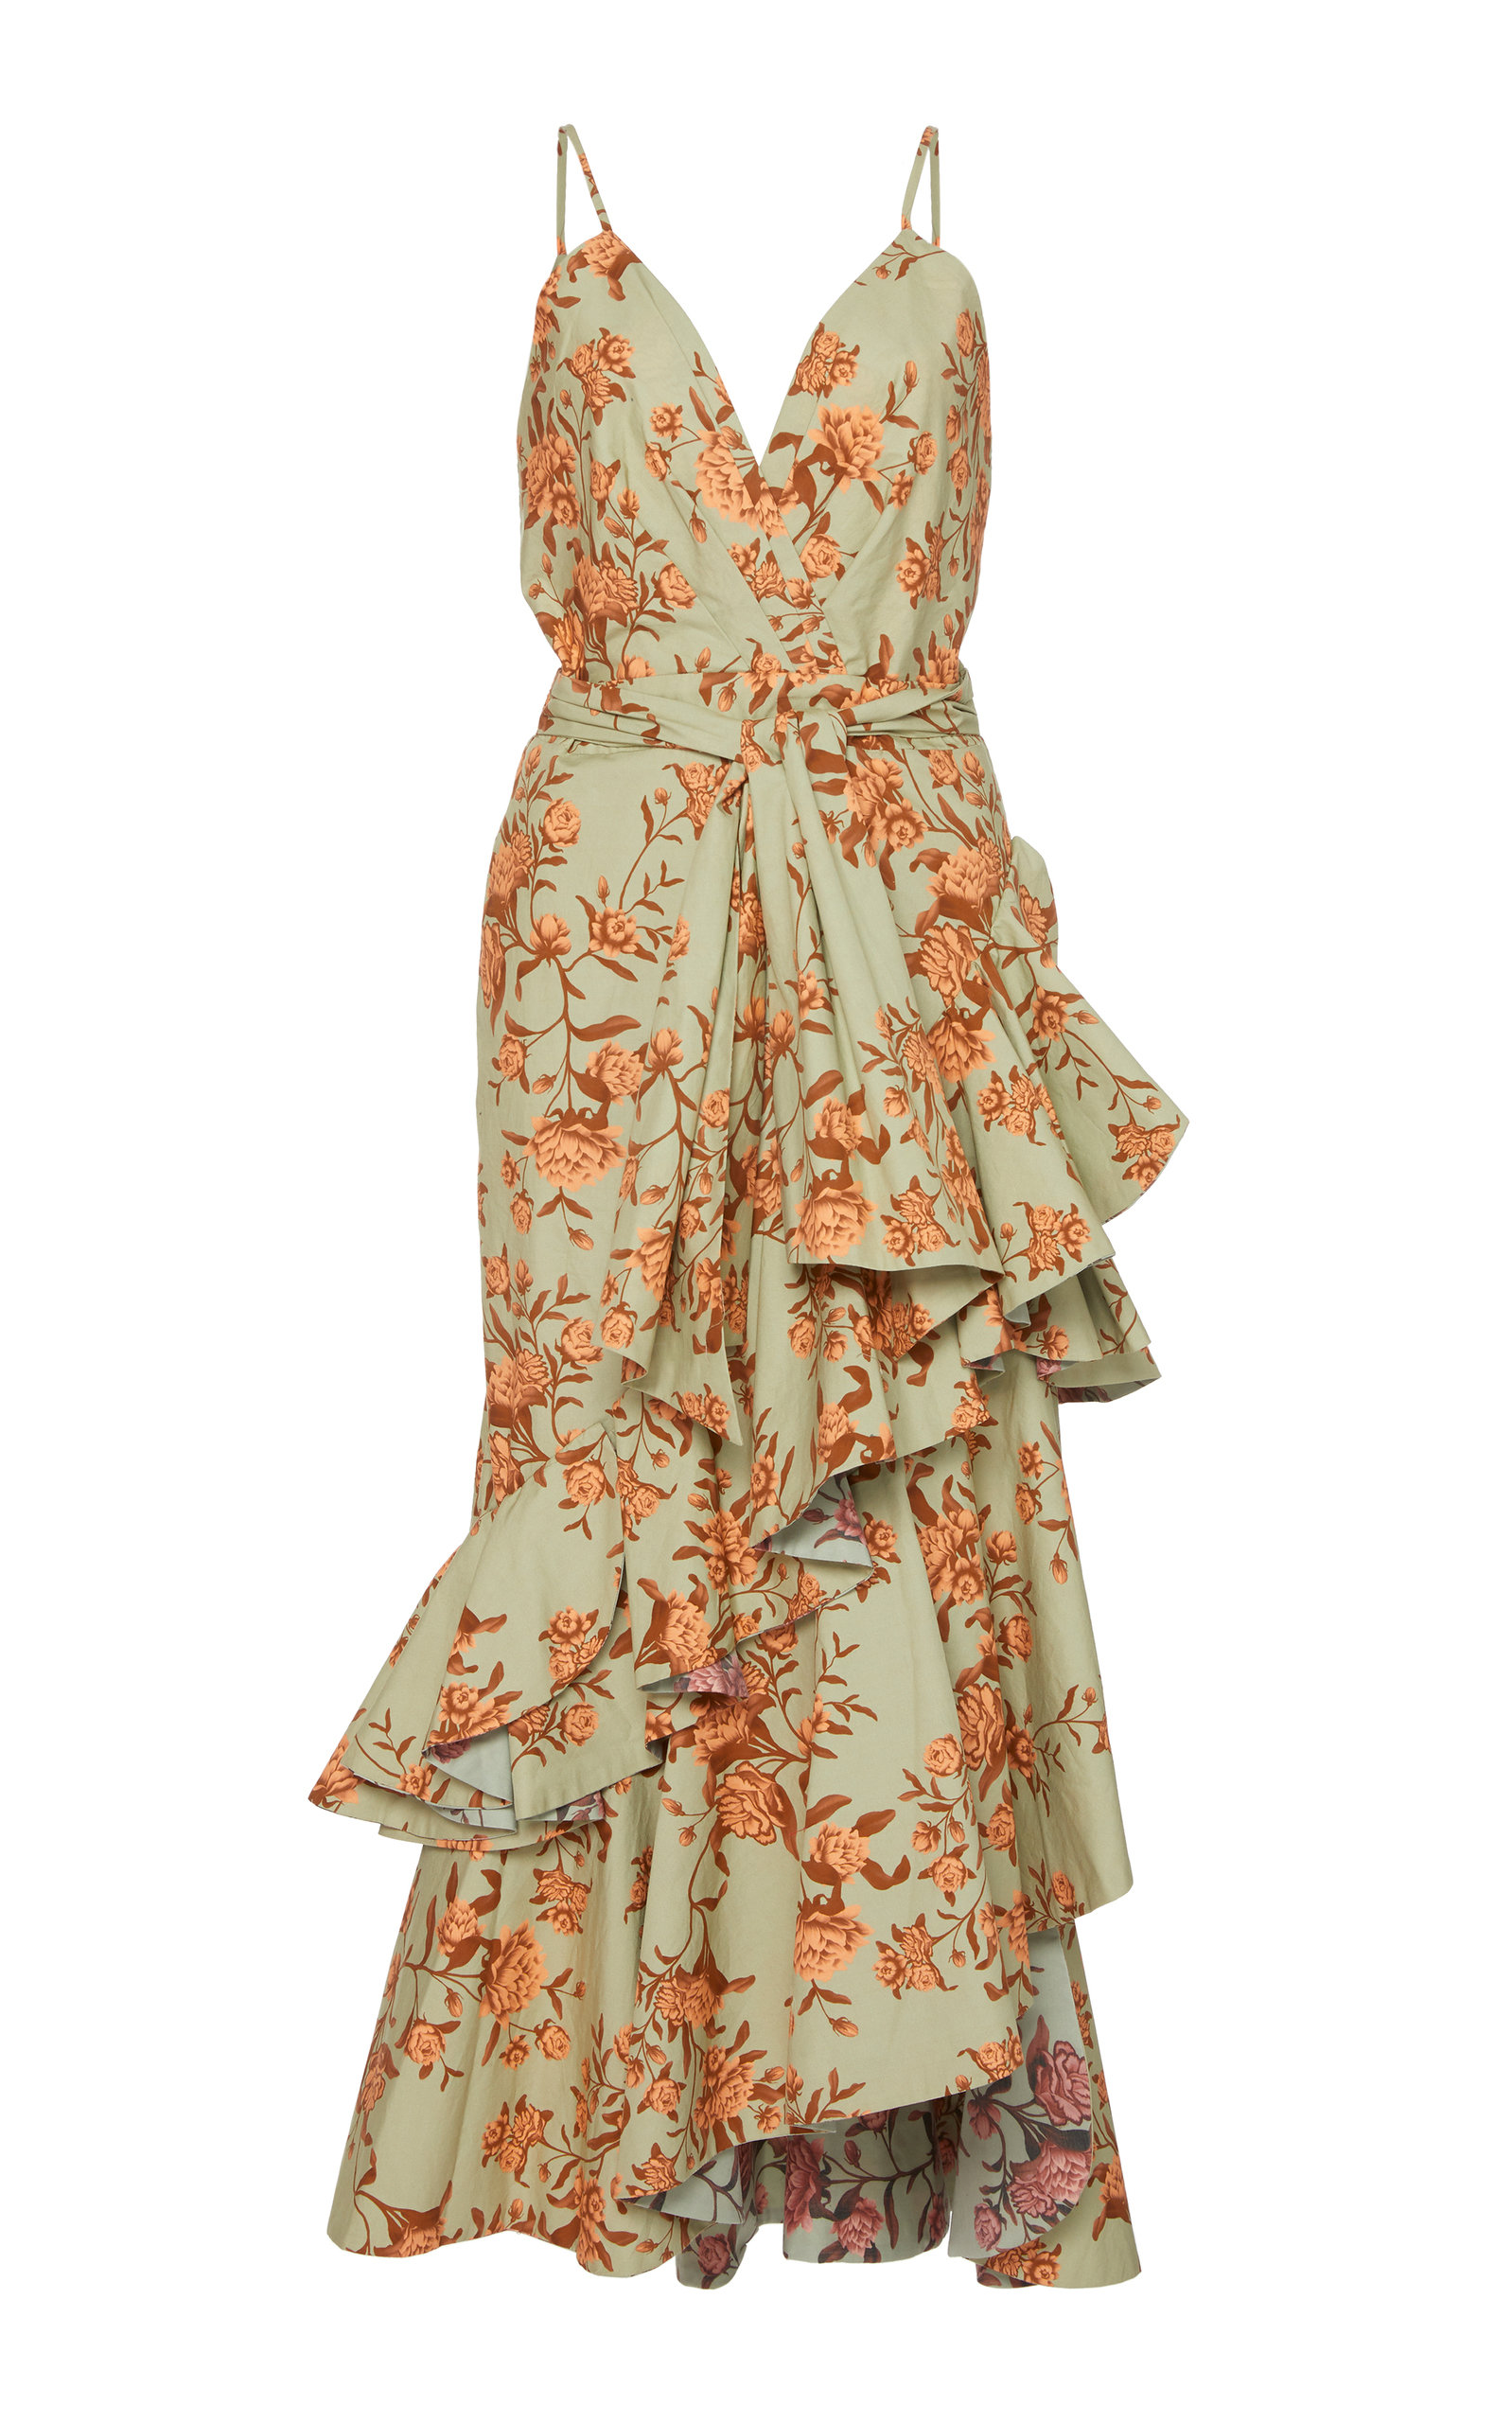 6d60fe9971f Johanna OrtizRhapsodie Oriental Floral Cotton-Poplin Dress. CLOSE. Loading